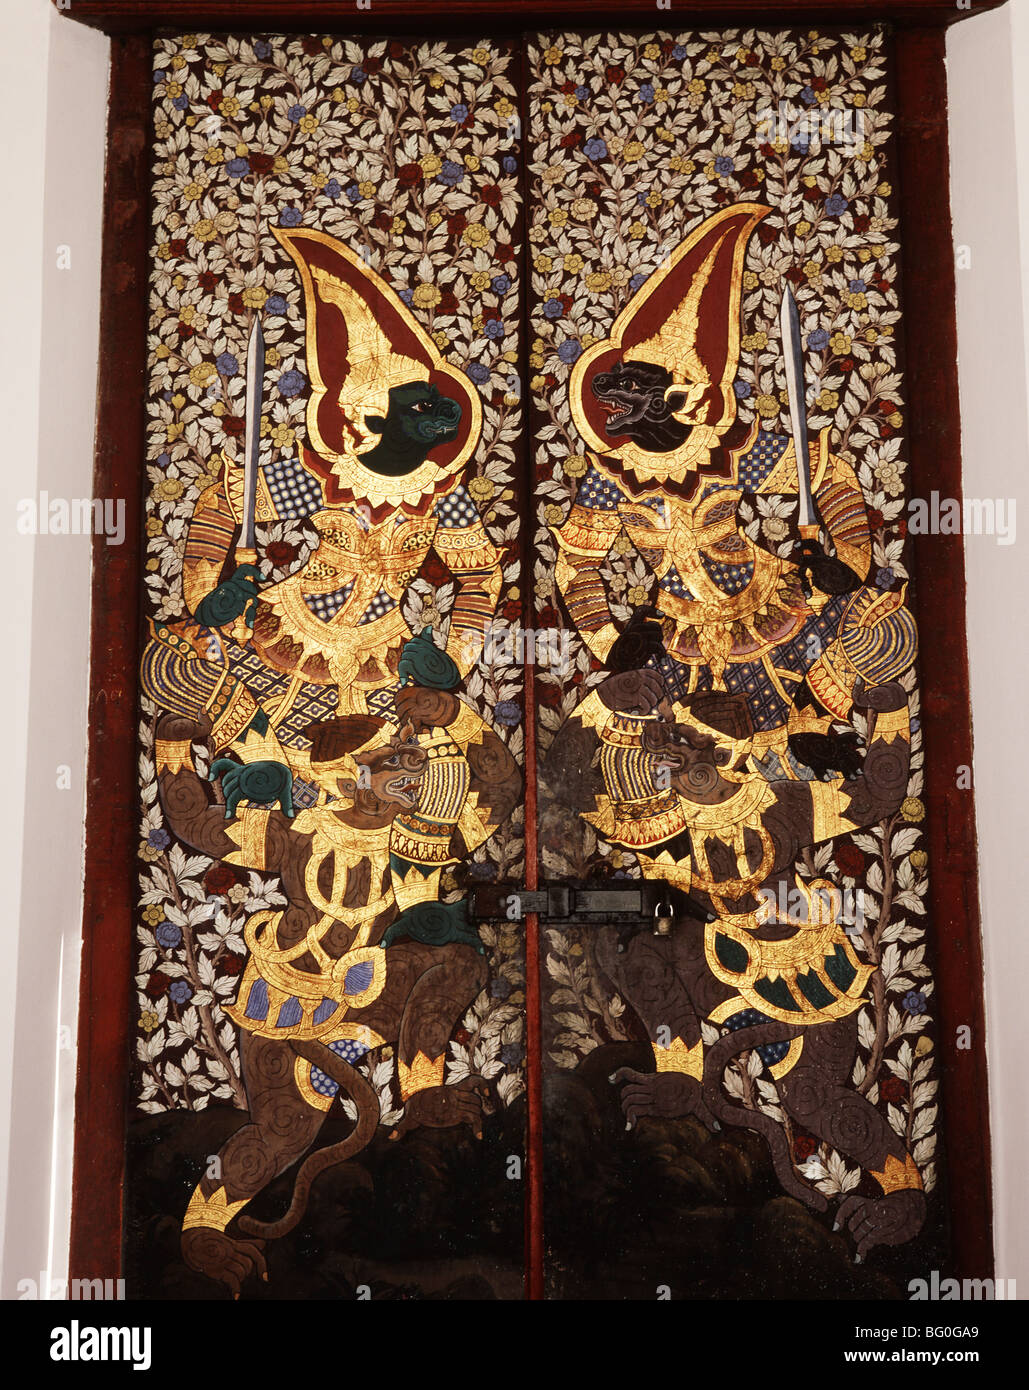 Thai door detail, Wat Suthat, Bankgok, Thailand, Southeast Asia, Asia - Stock Image